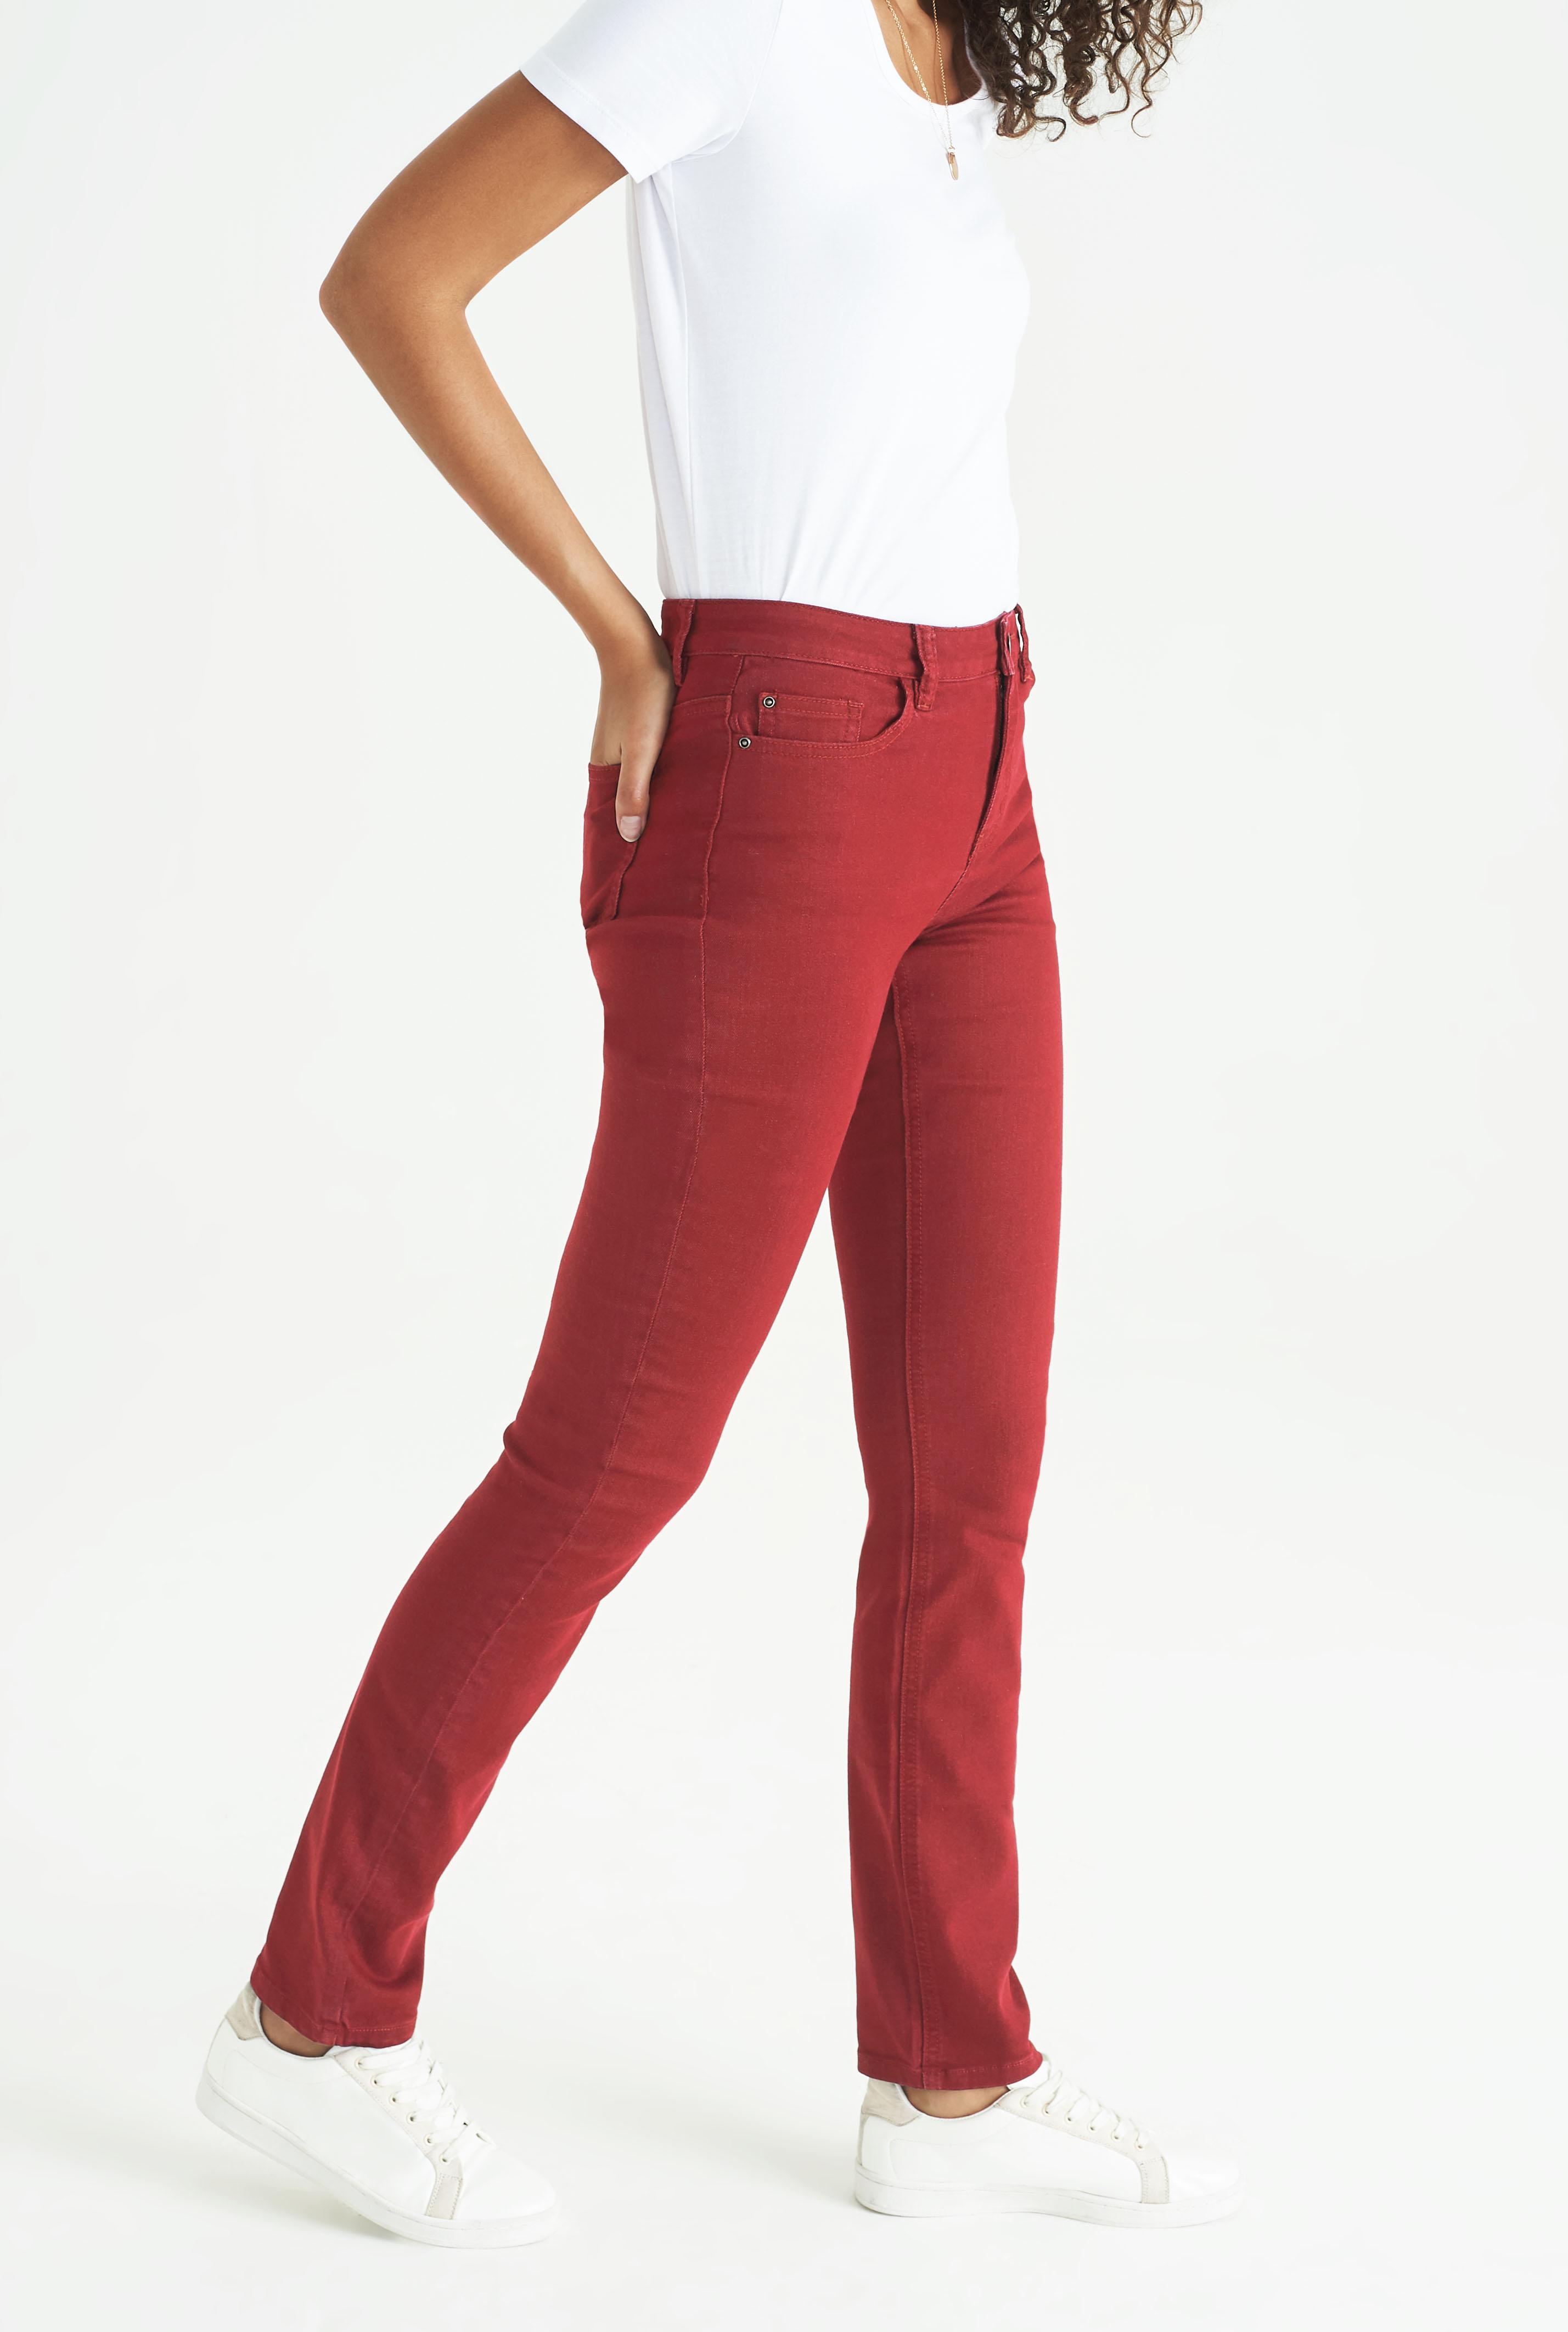 Red Slim Leg Mid Rise Jeans